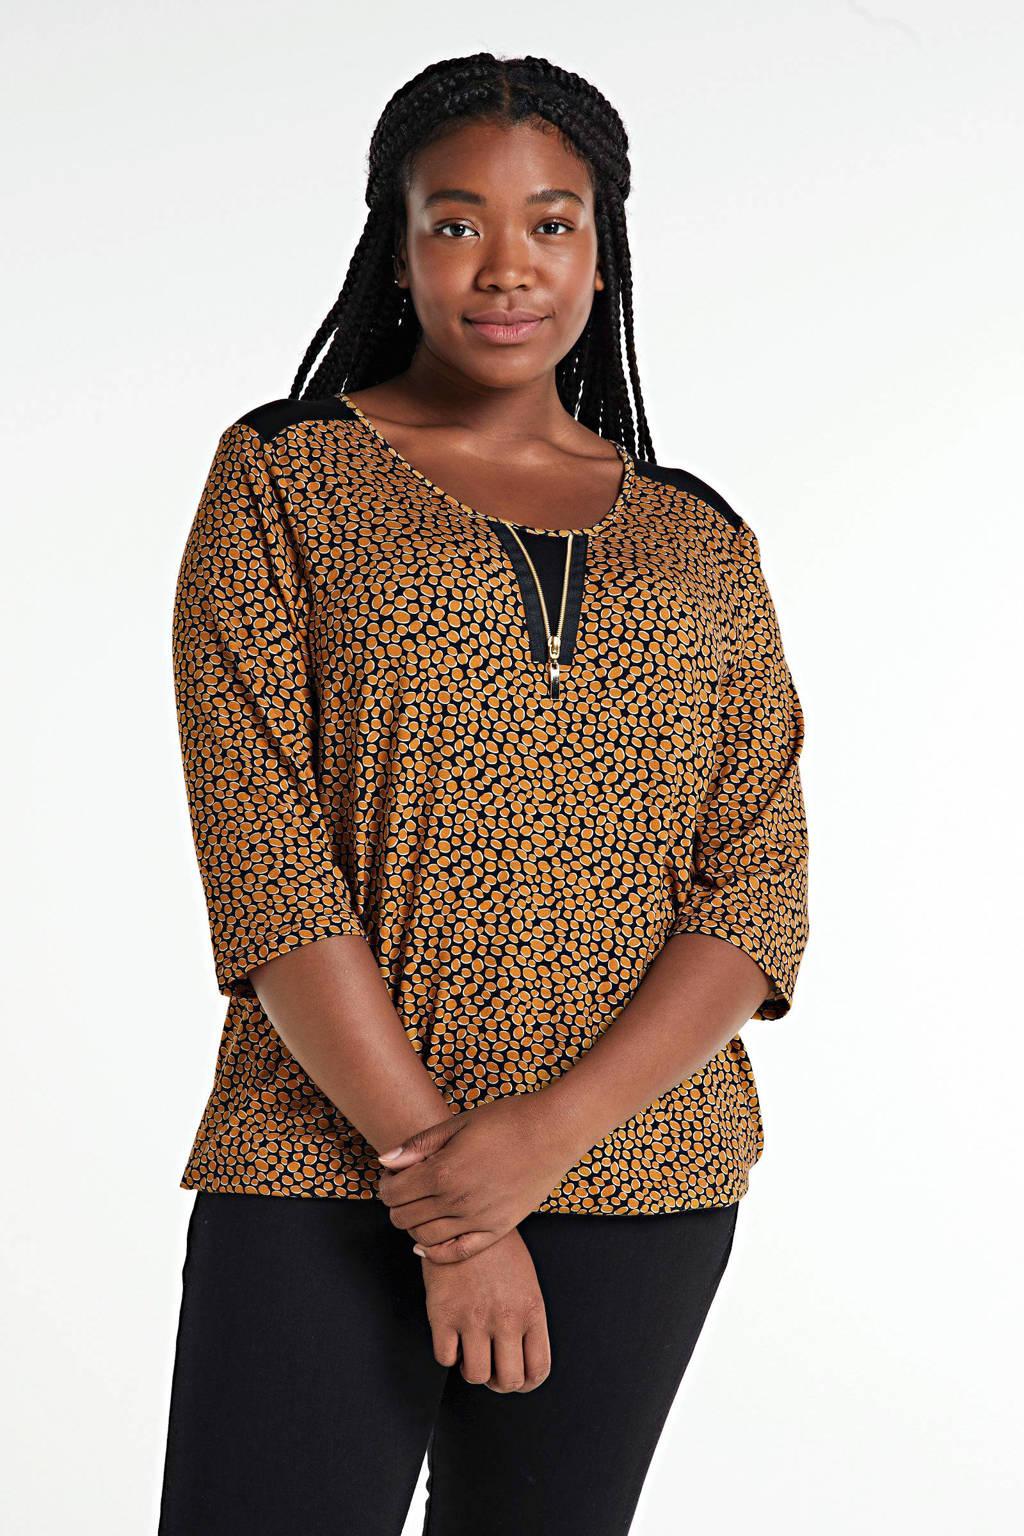 CHOISE top met all over print donker oranje/zwart/wit, Donker oranje/zwart/wit